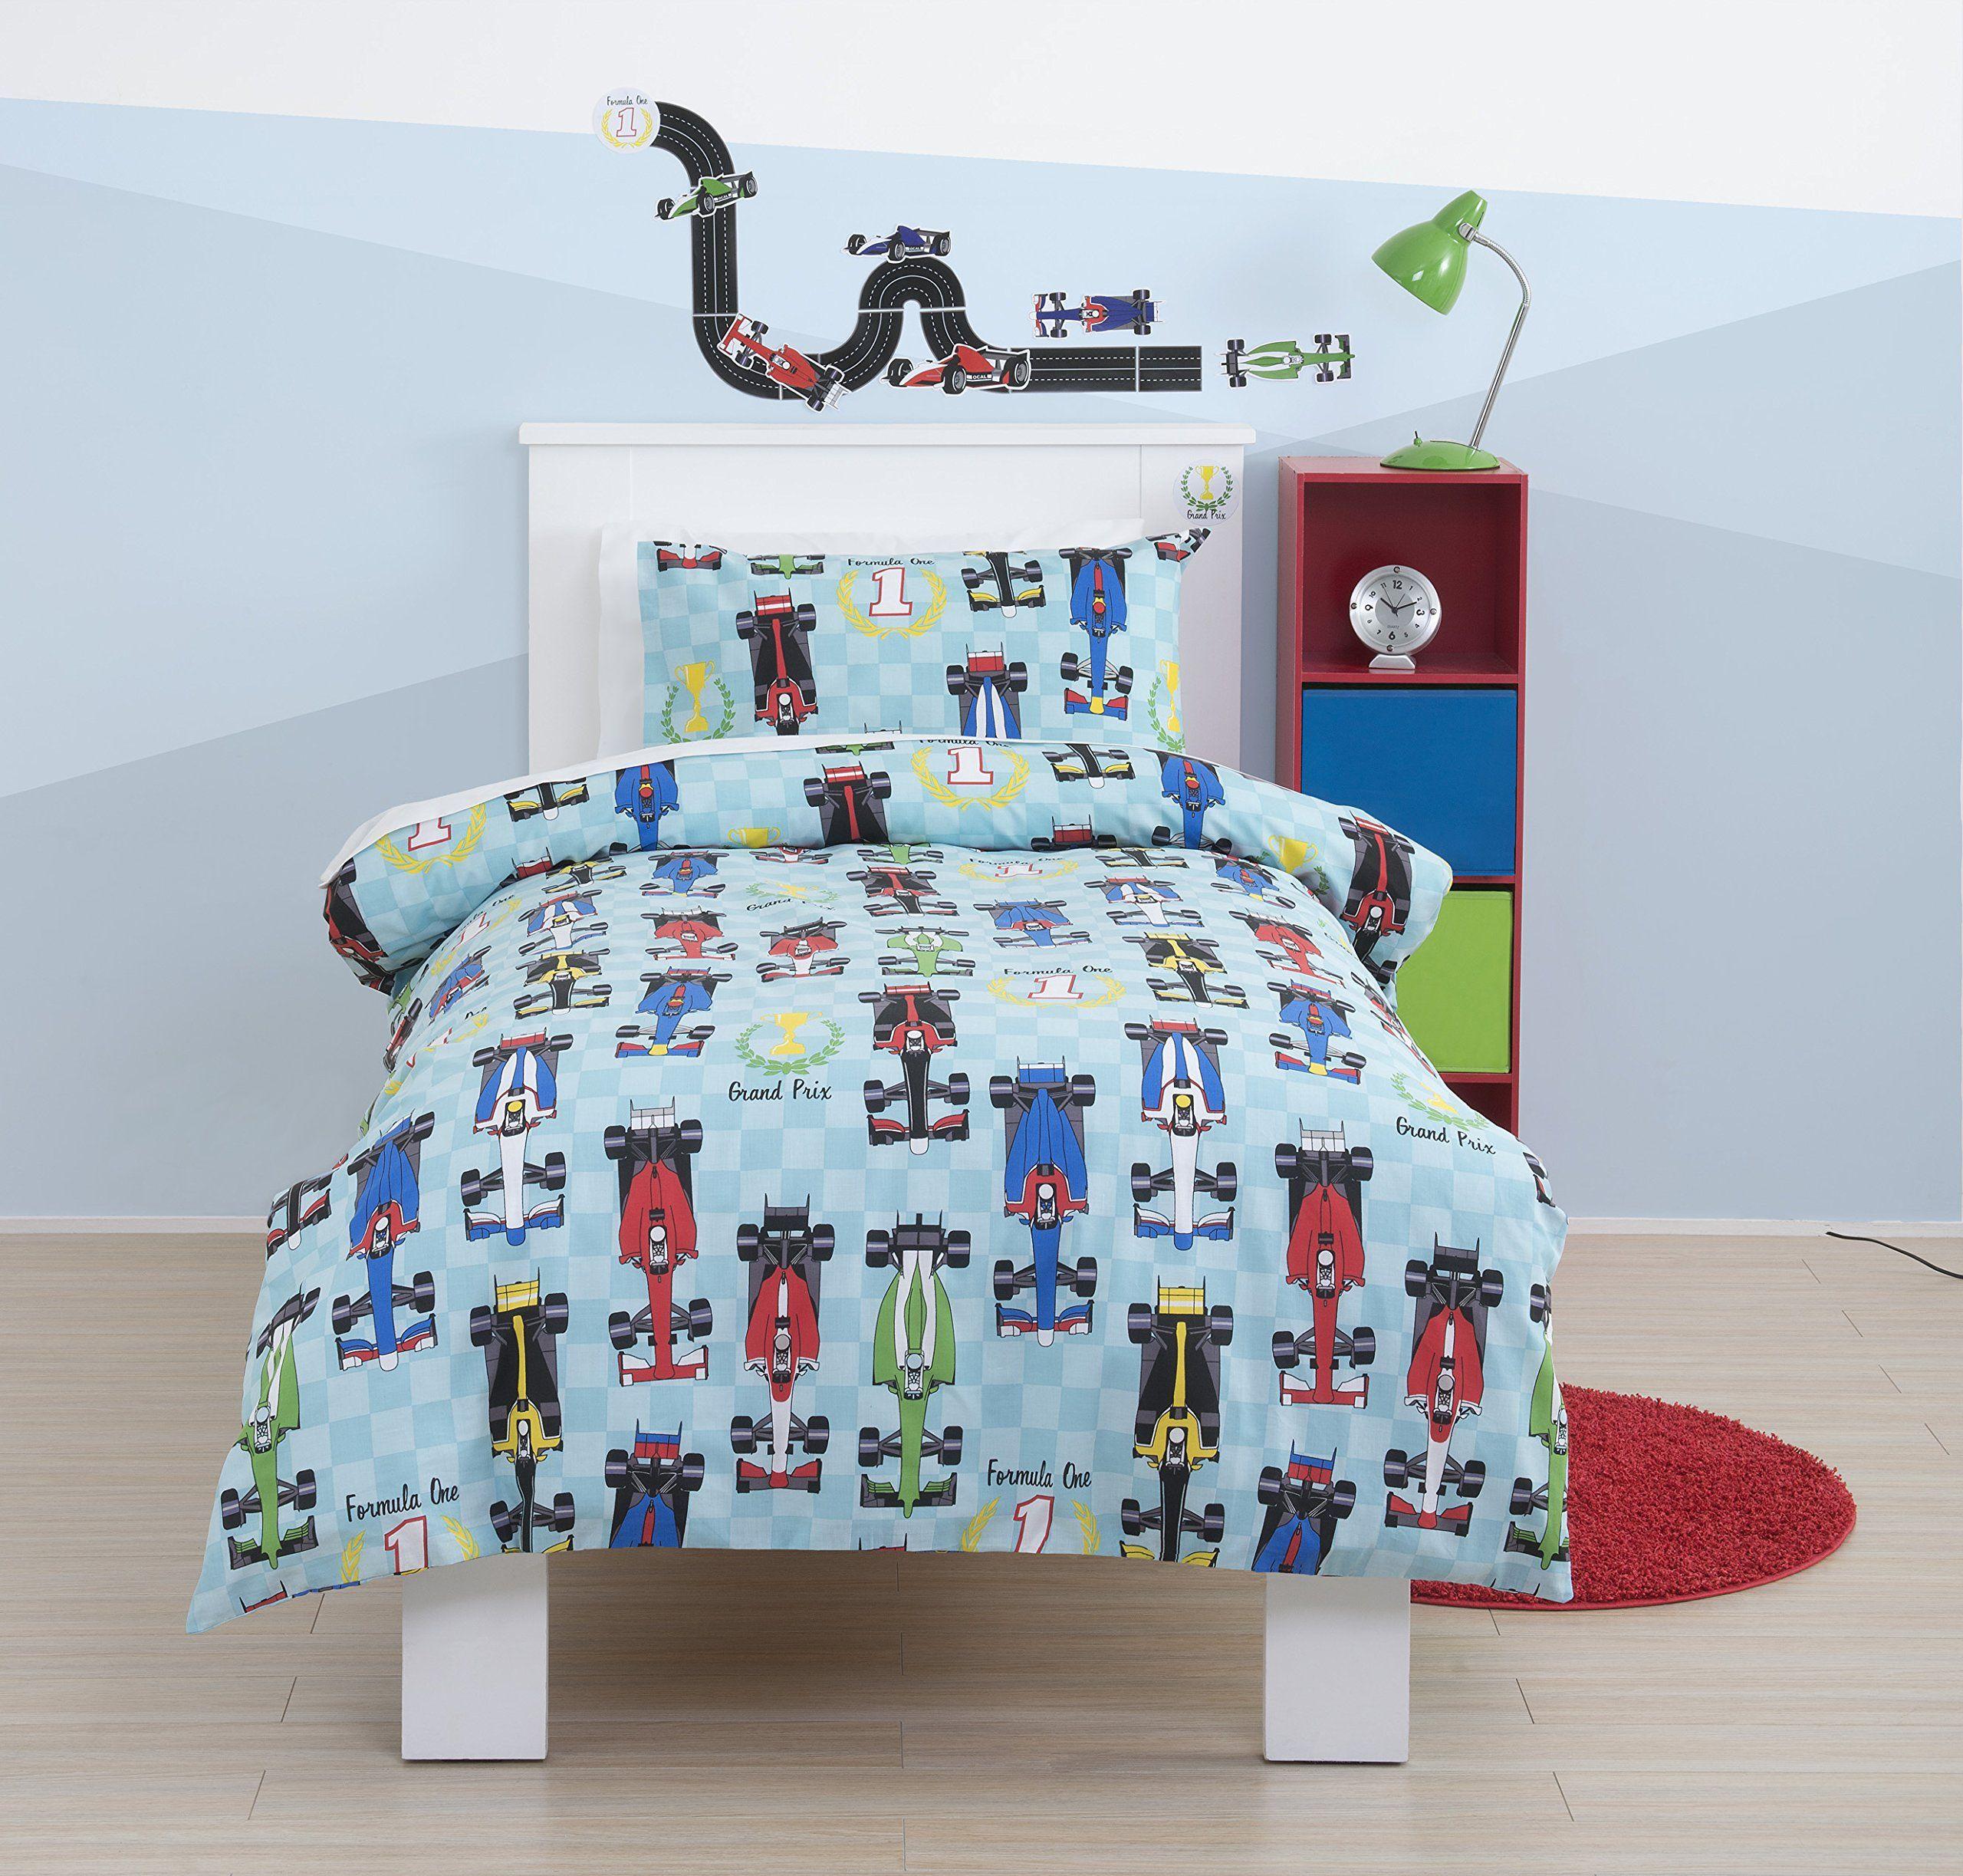 f1 formula1 cars single boys duvet bedding set also available for toddler cotbed bedding